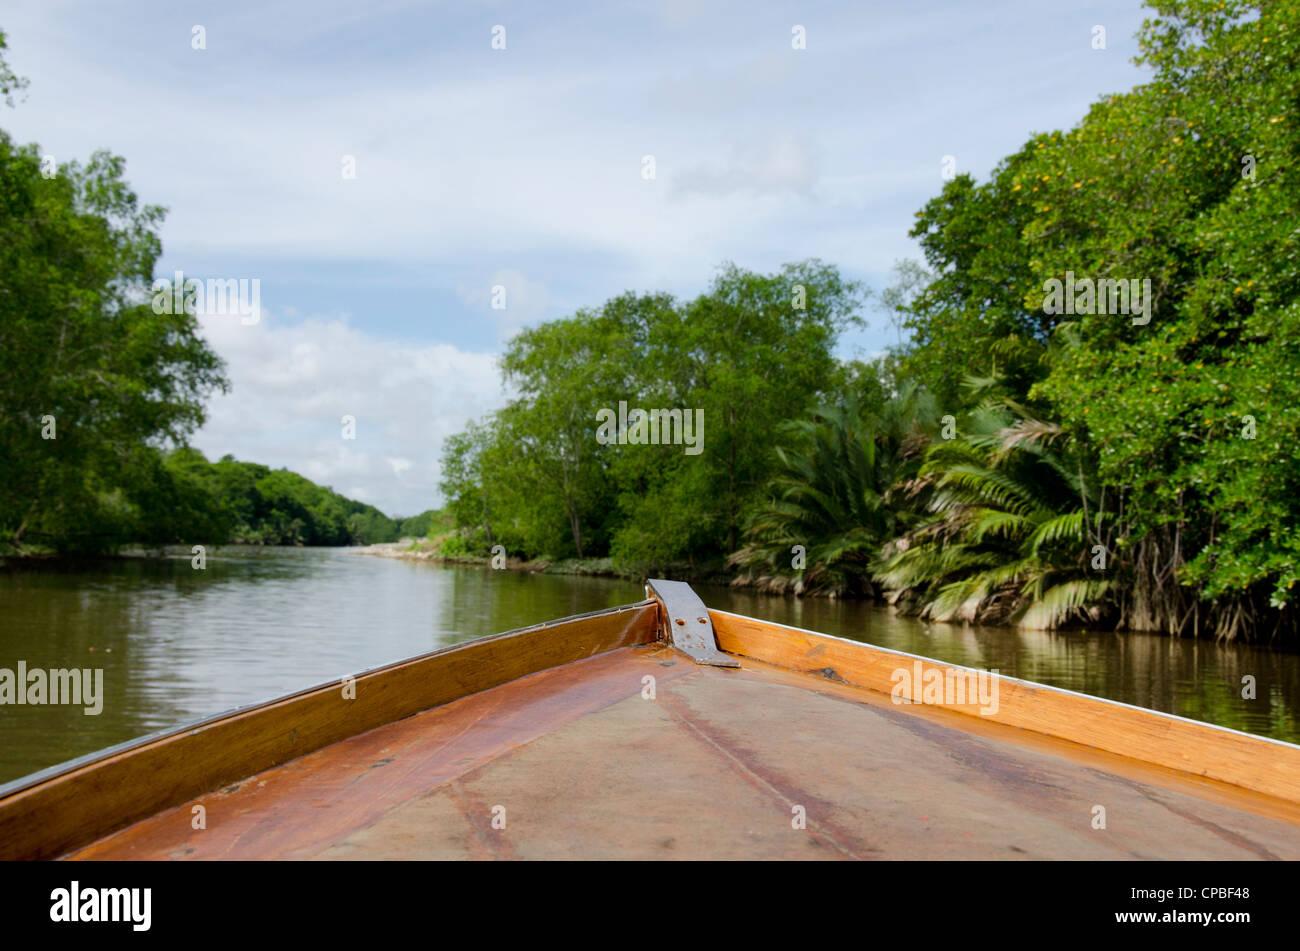 Southeast Asia, Borneo, Brunei. Dense mangrove forest along the Brunei river. - Stock Image